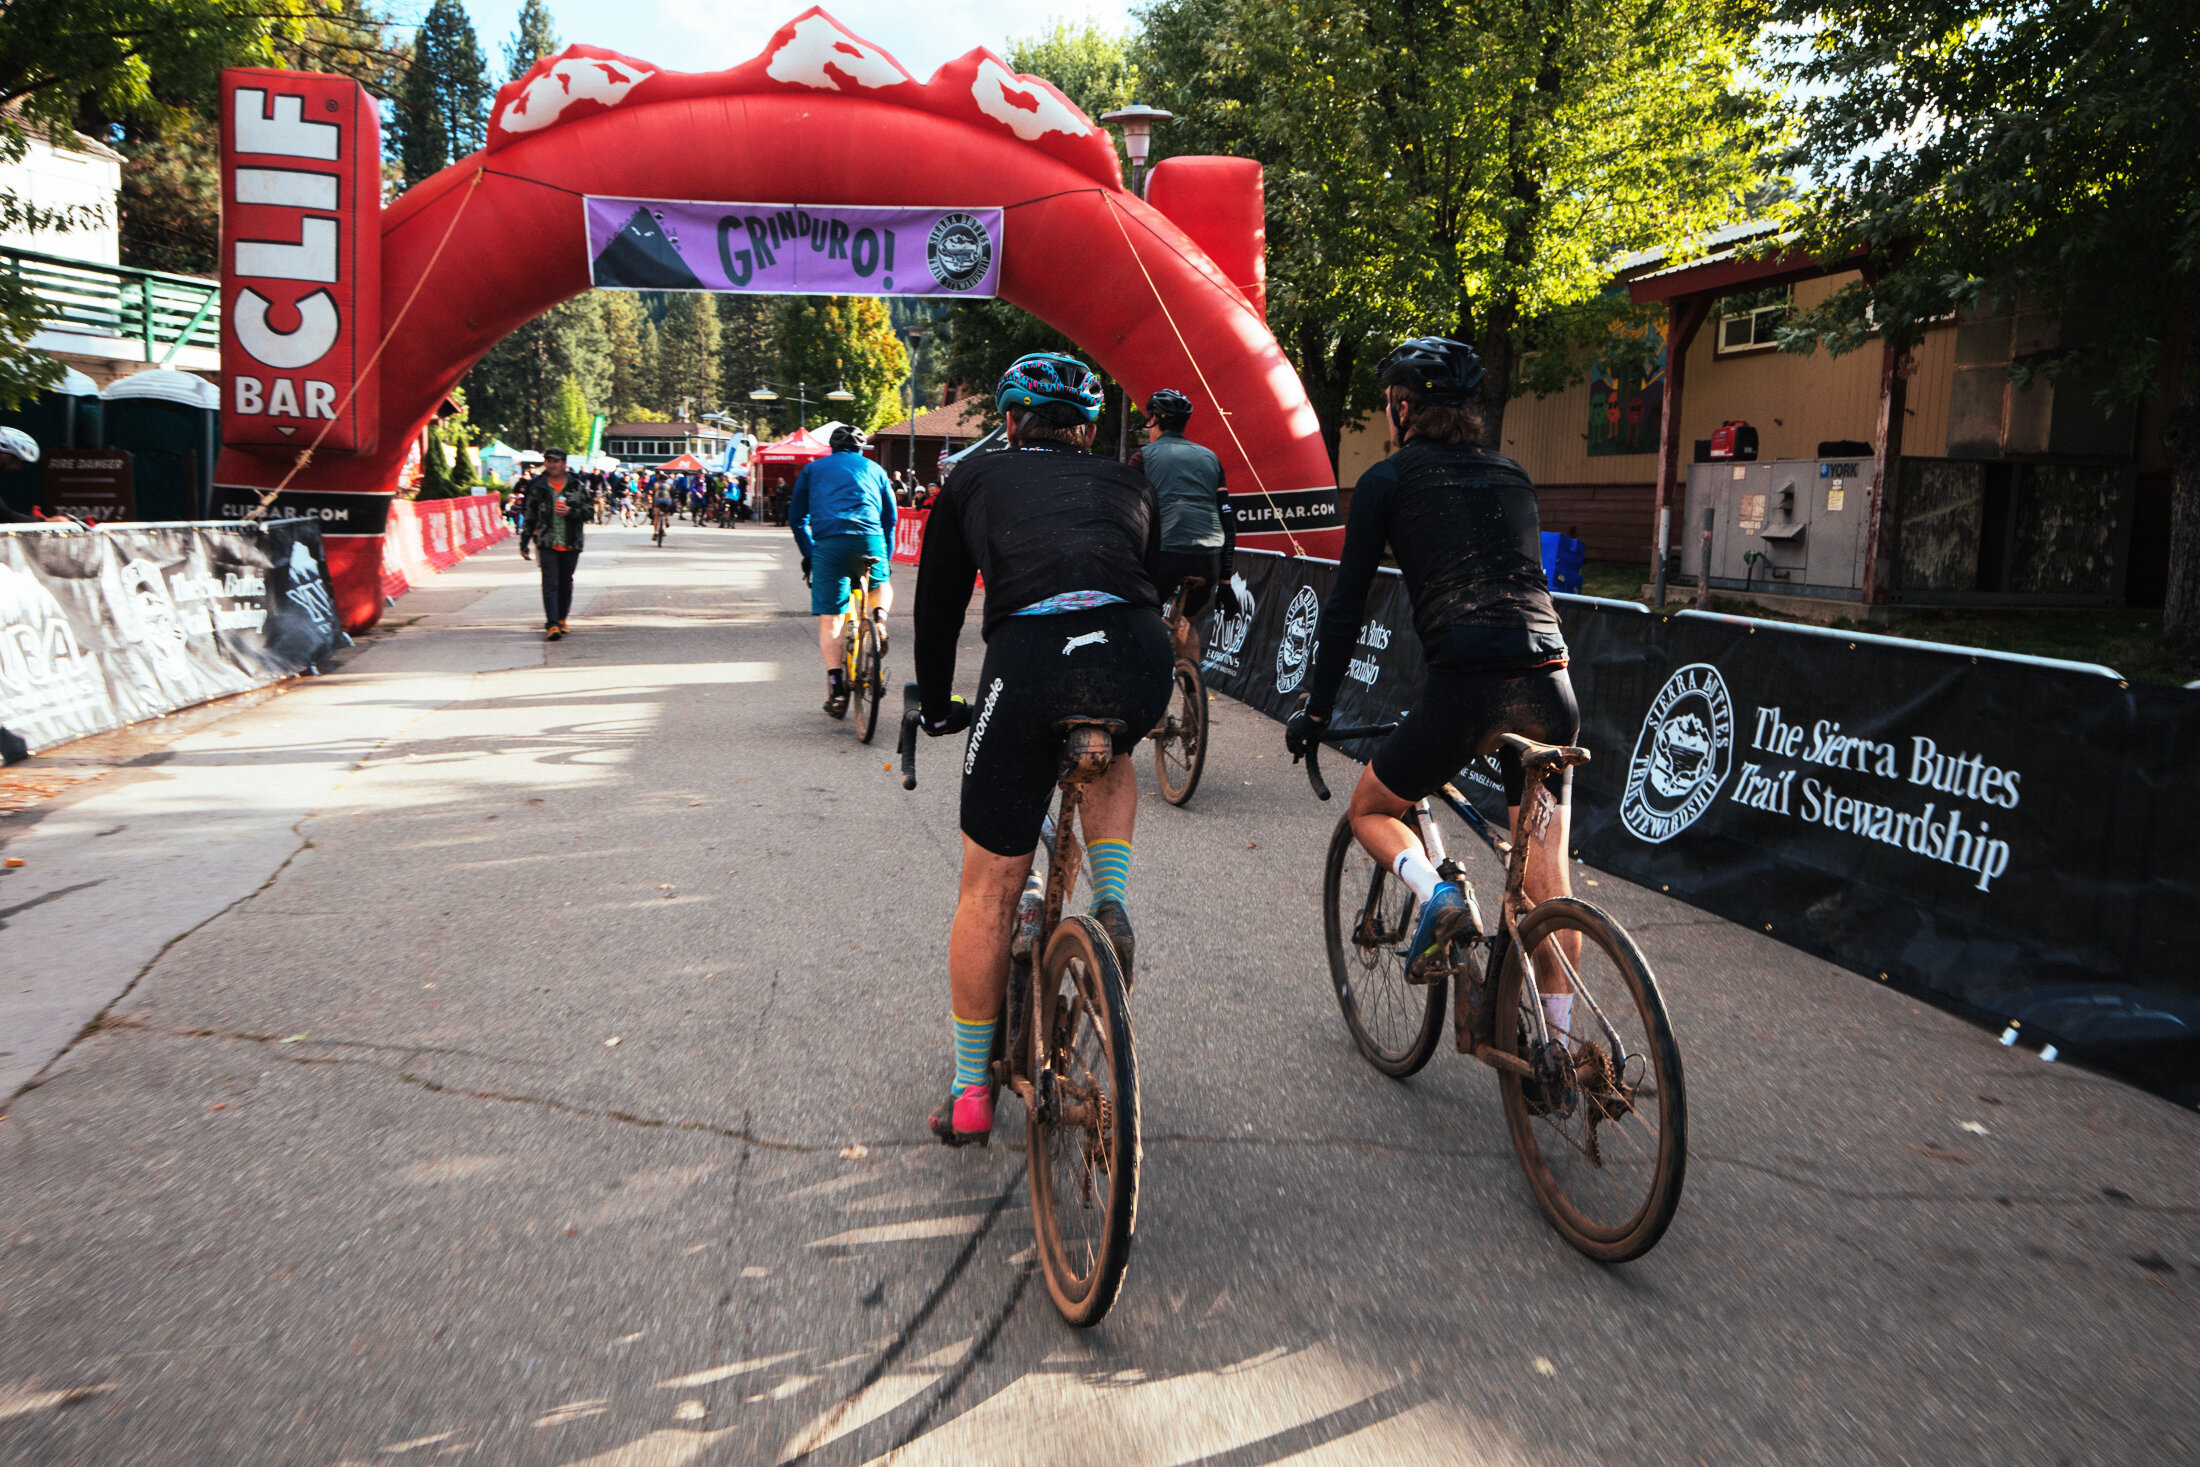 Grinduro 2019 Finish Line Bike Race